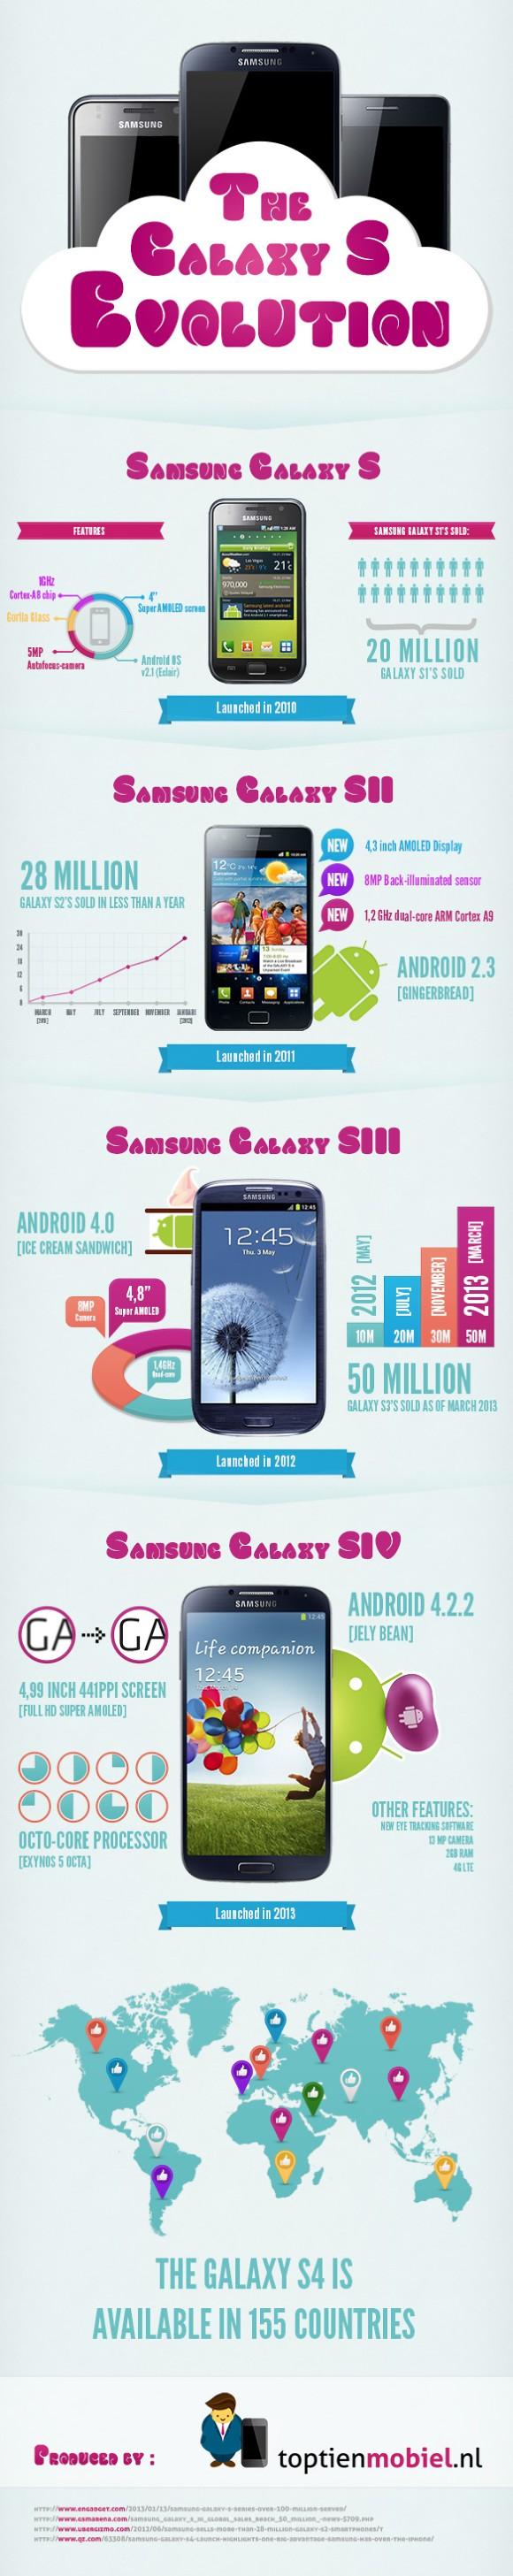 SamsungGalaxySInfographic